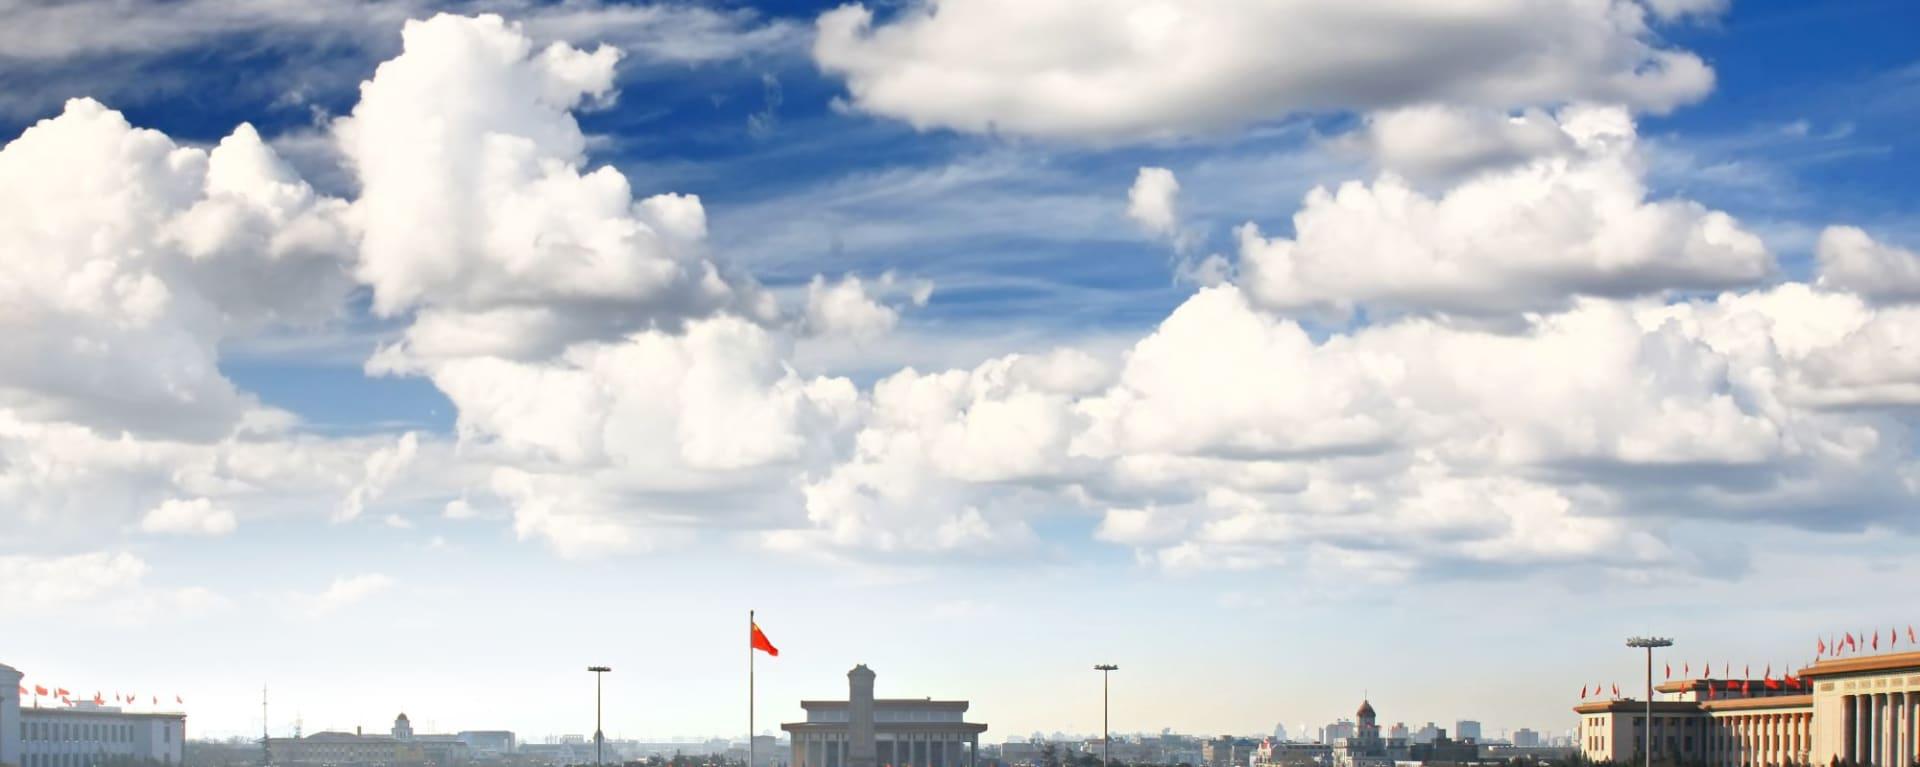 Tiananmen Square & Cité Interdite à Pékin: Beijing Tiananmen Square